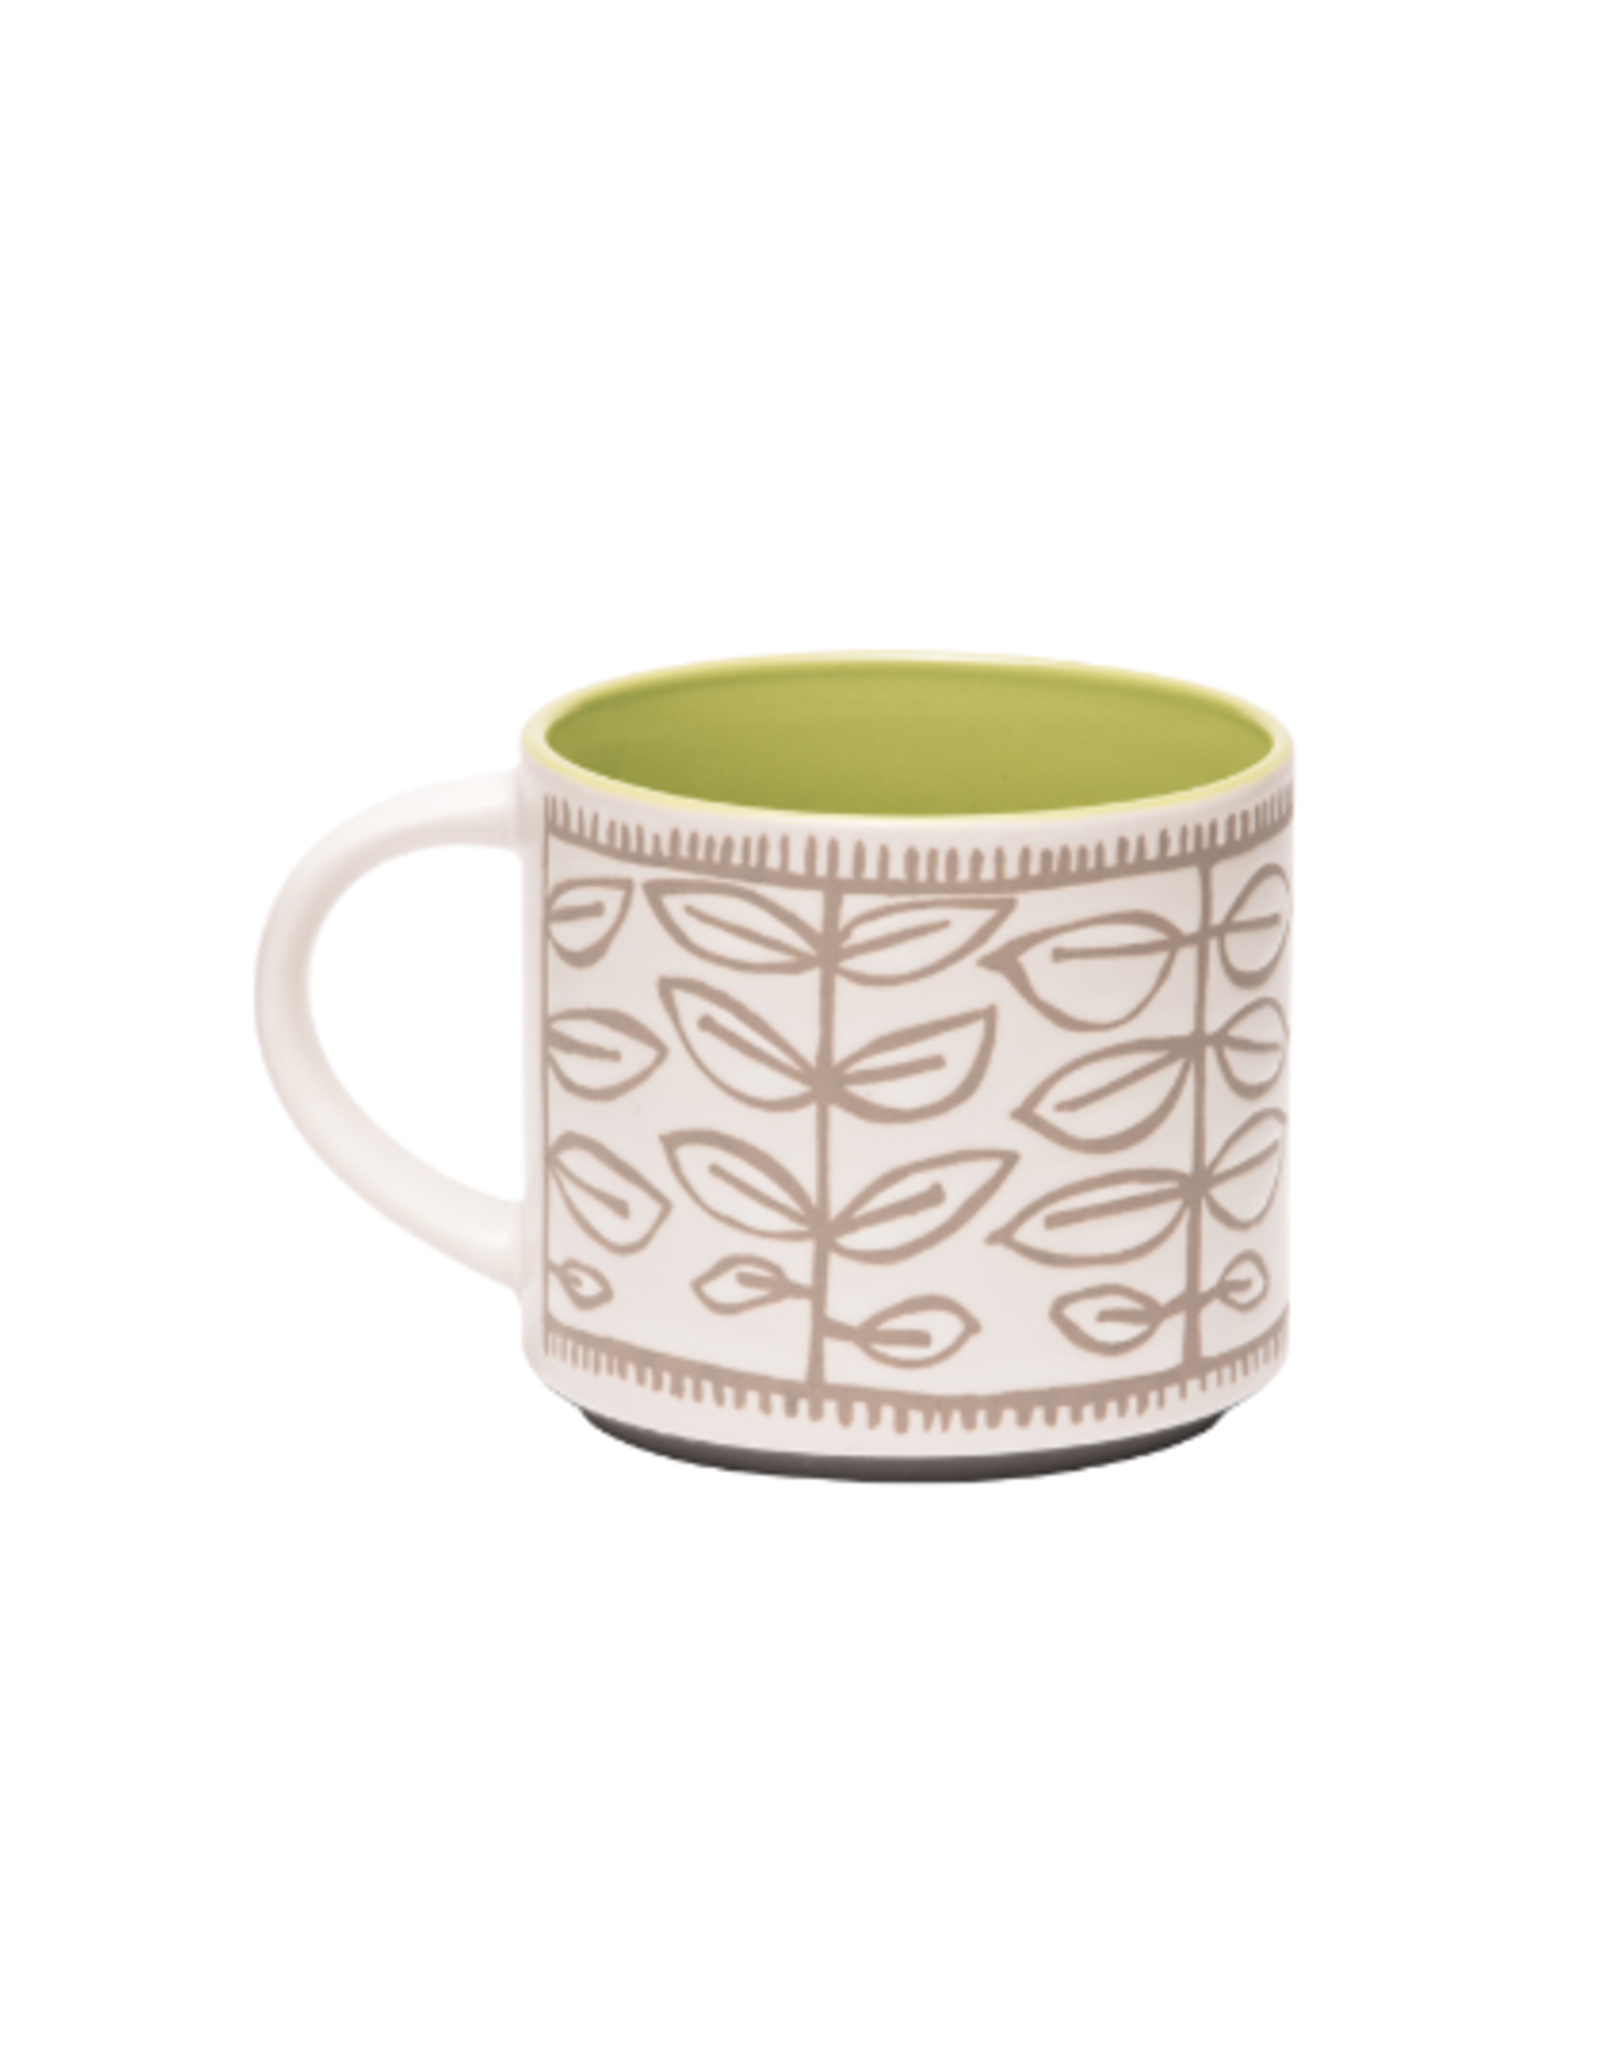 ORE Originals Pop of Color Mug, Tea Leaf